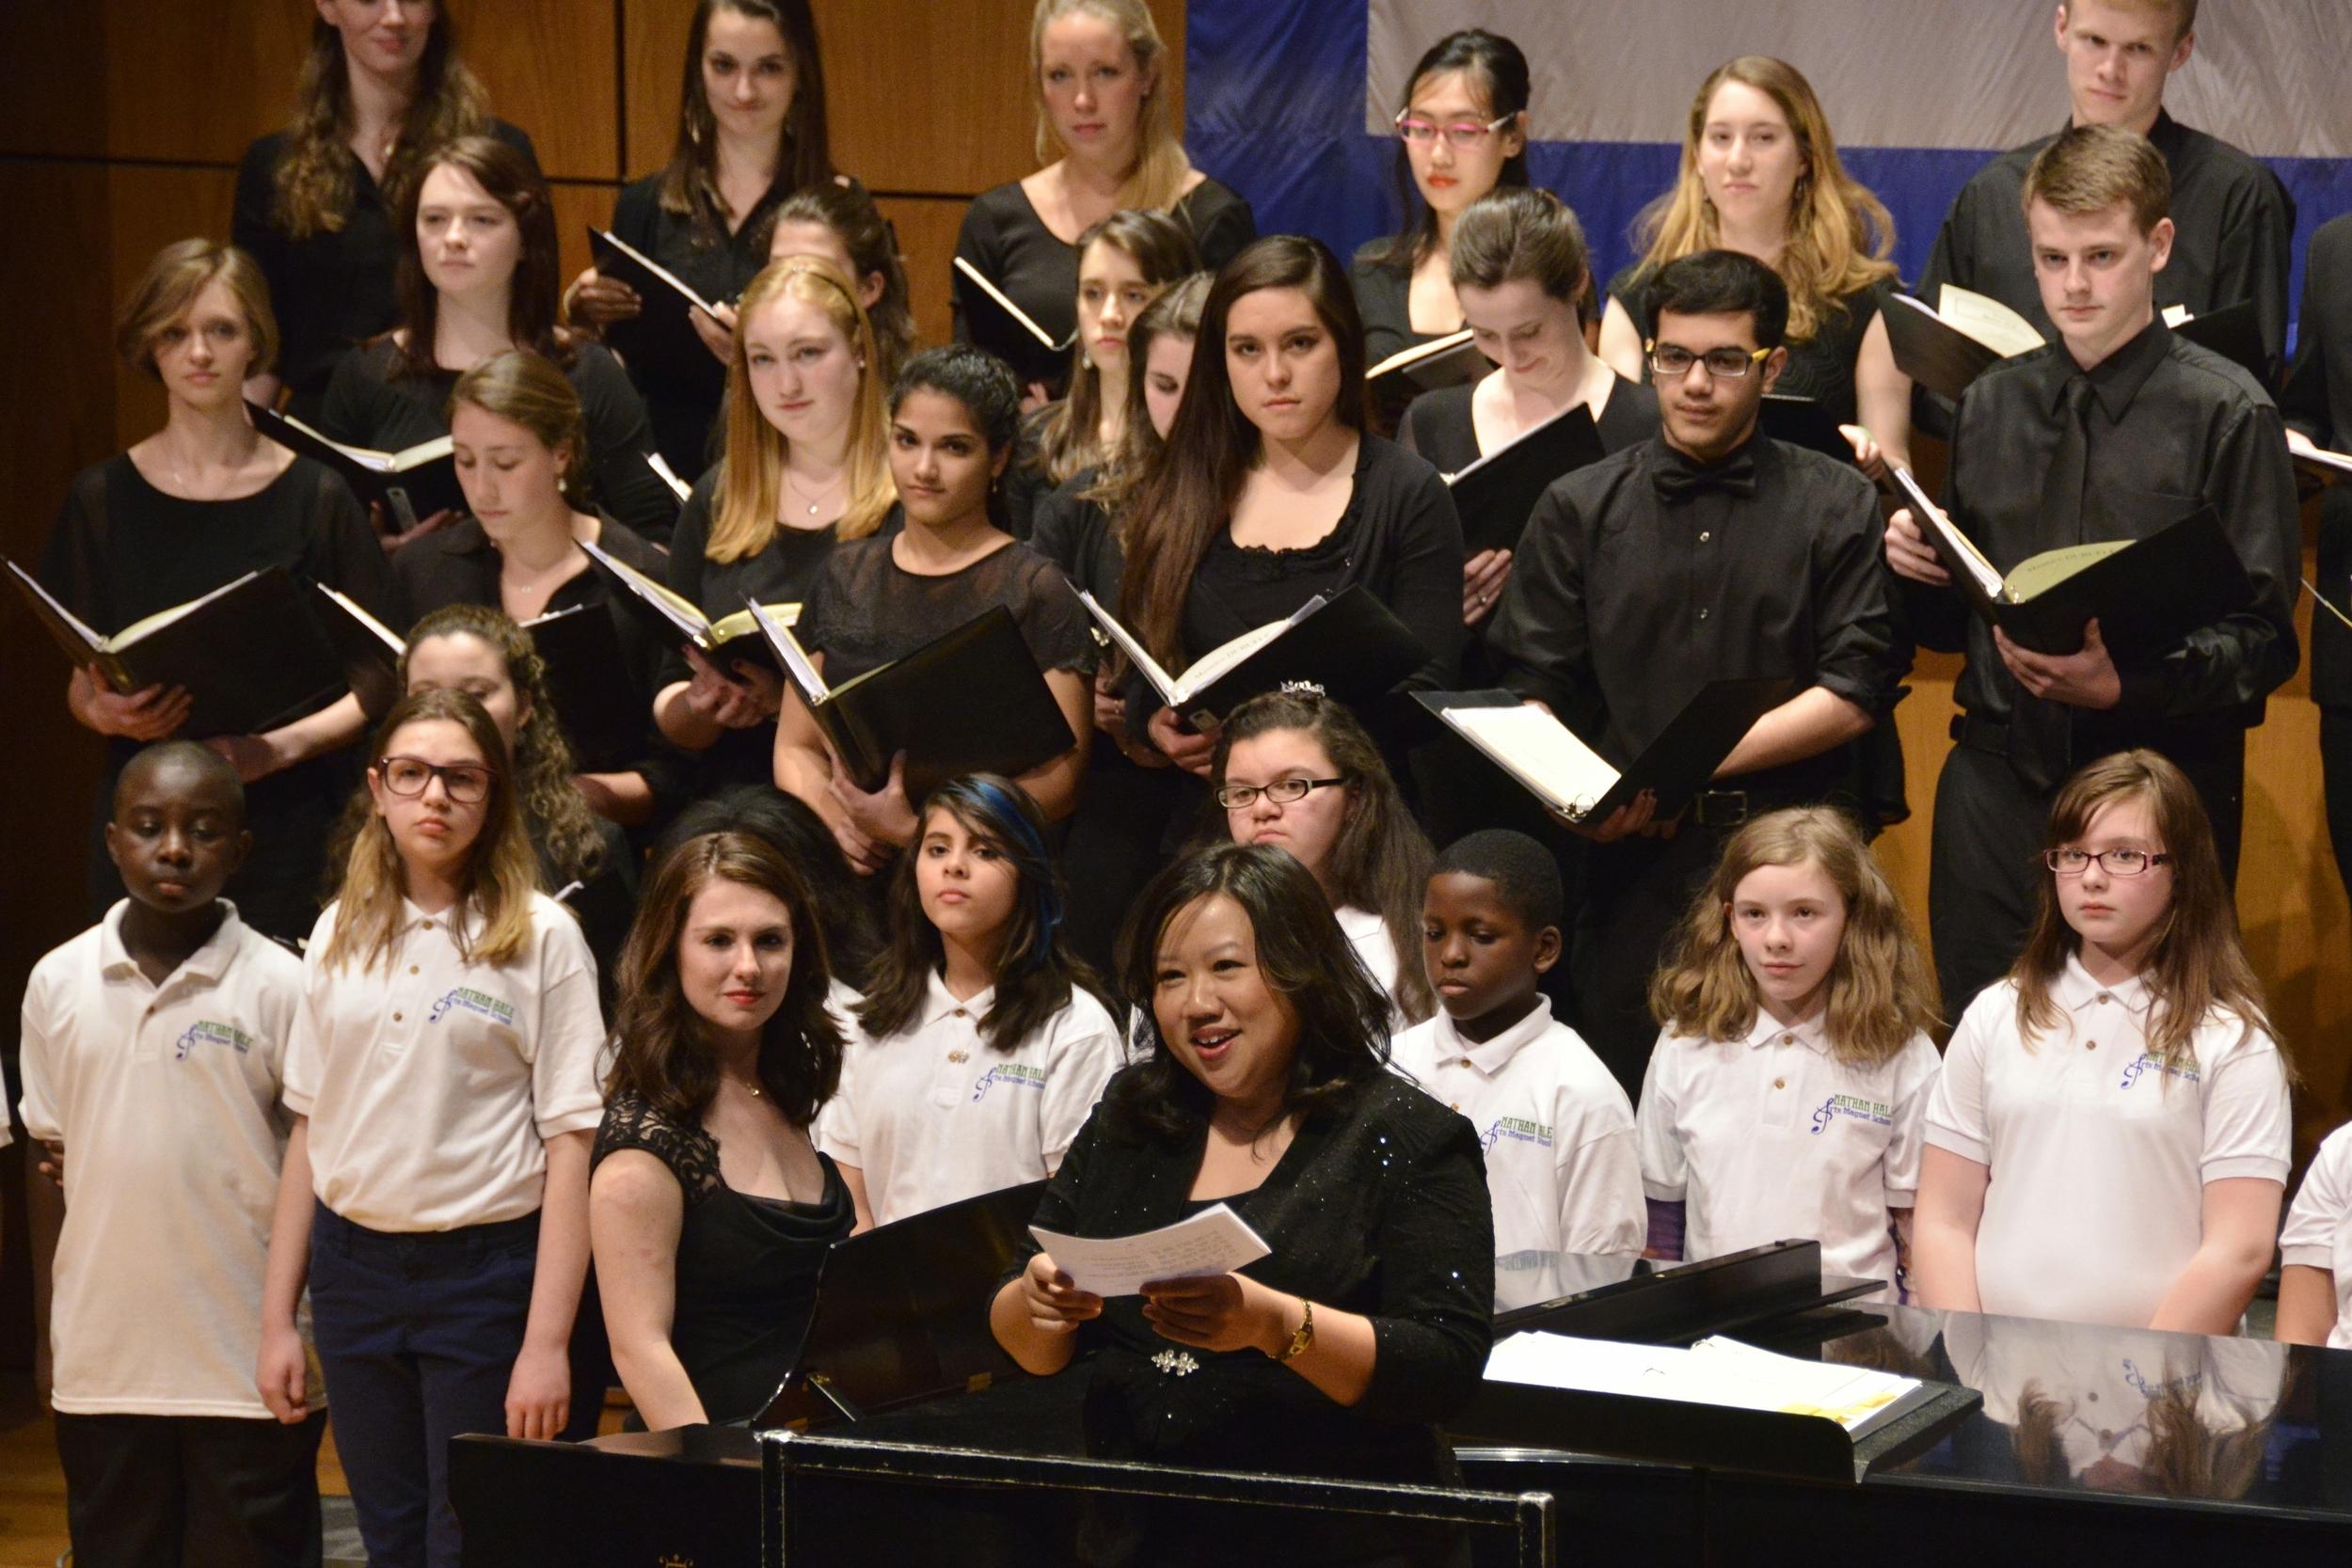 Ubi Caritas with Nathan Hale Arts Magnet School Children's Chorus